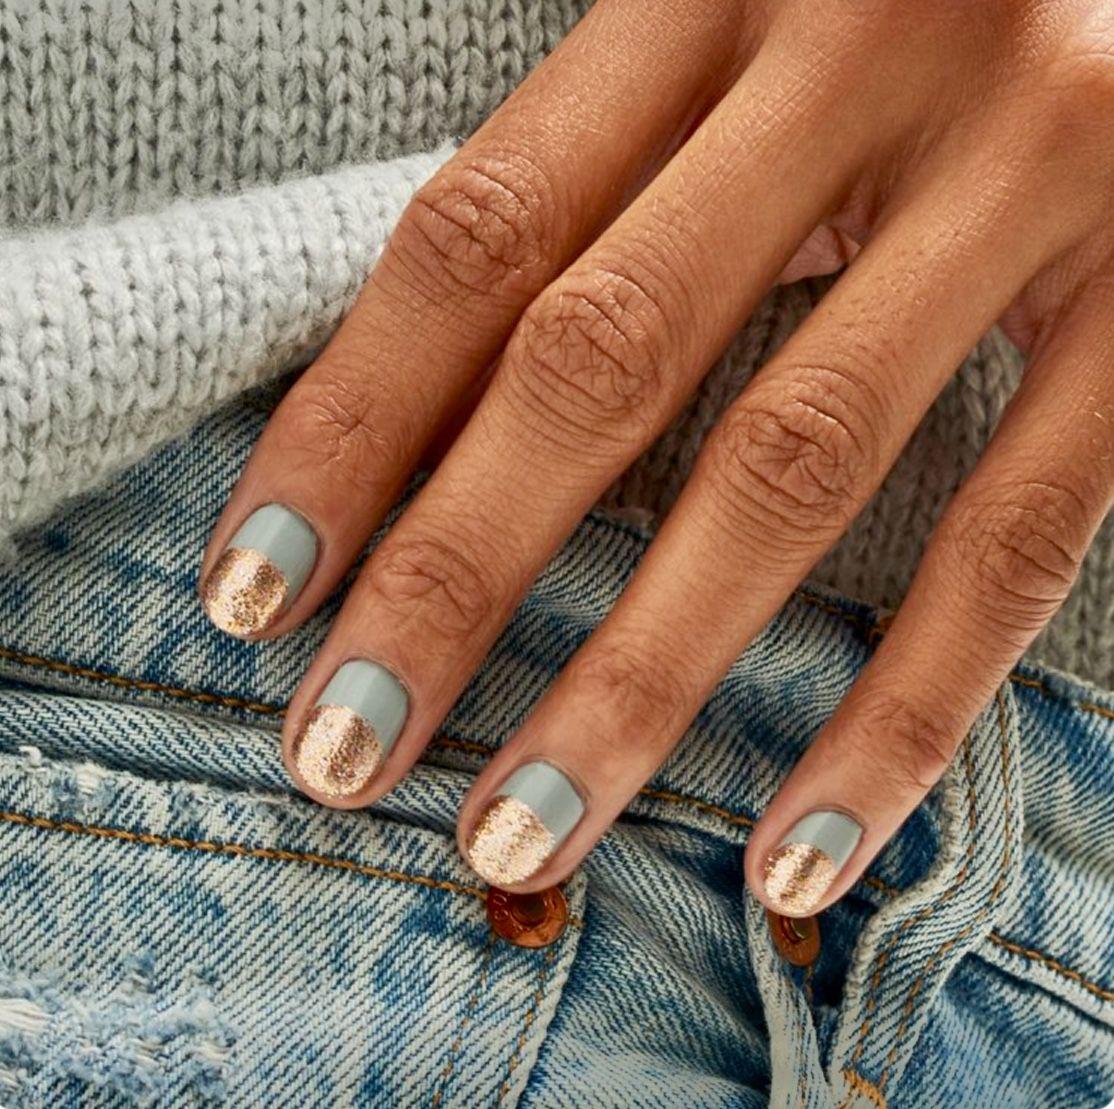 Pin By Halise Devrim On Stylish Hairish Minimalist Nails Short Gel Nails Nails